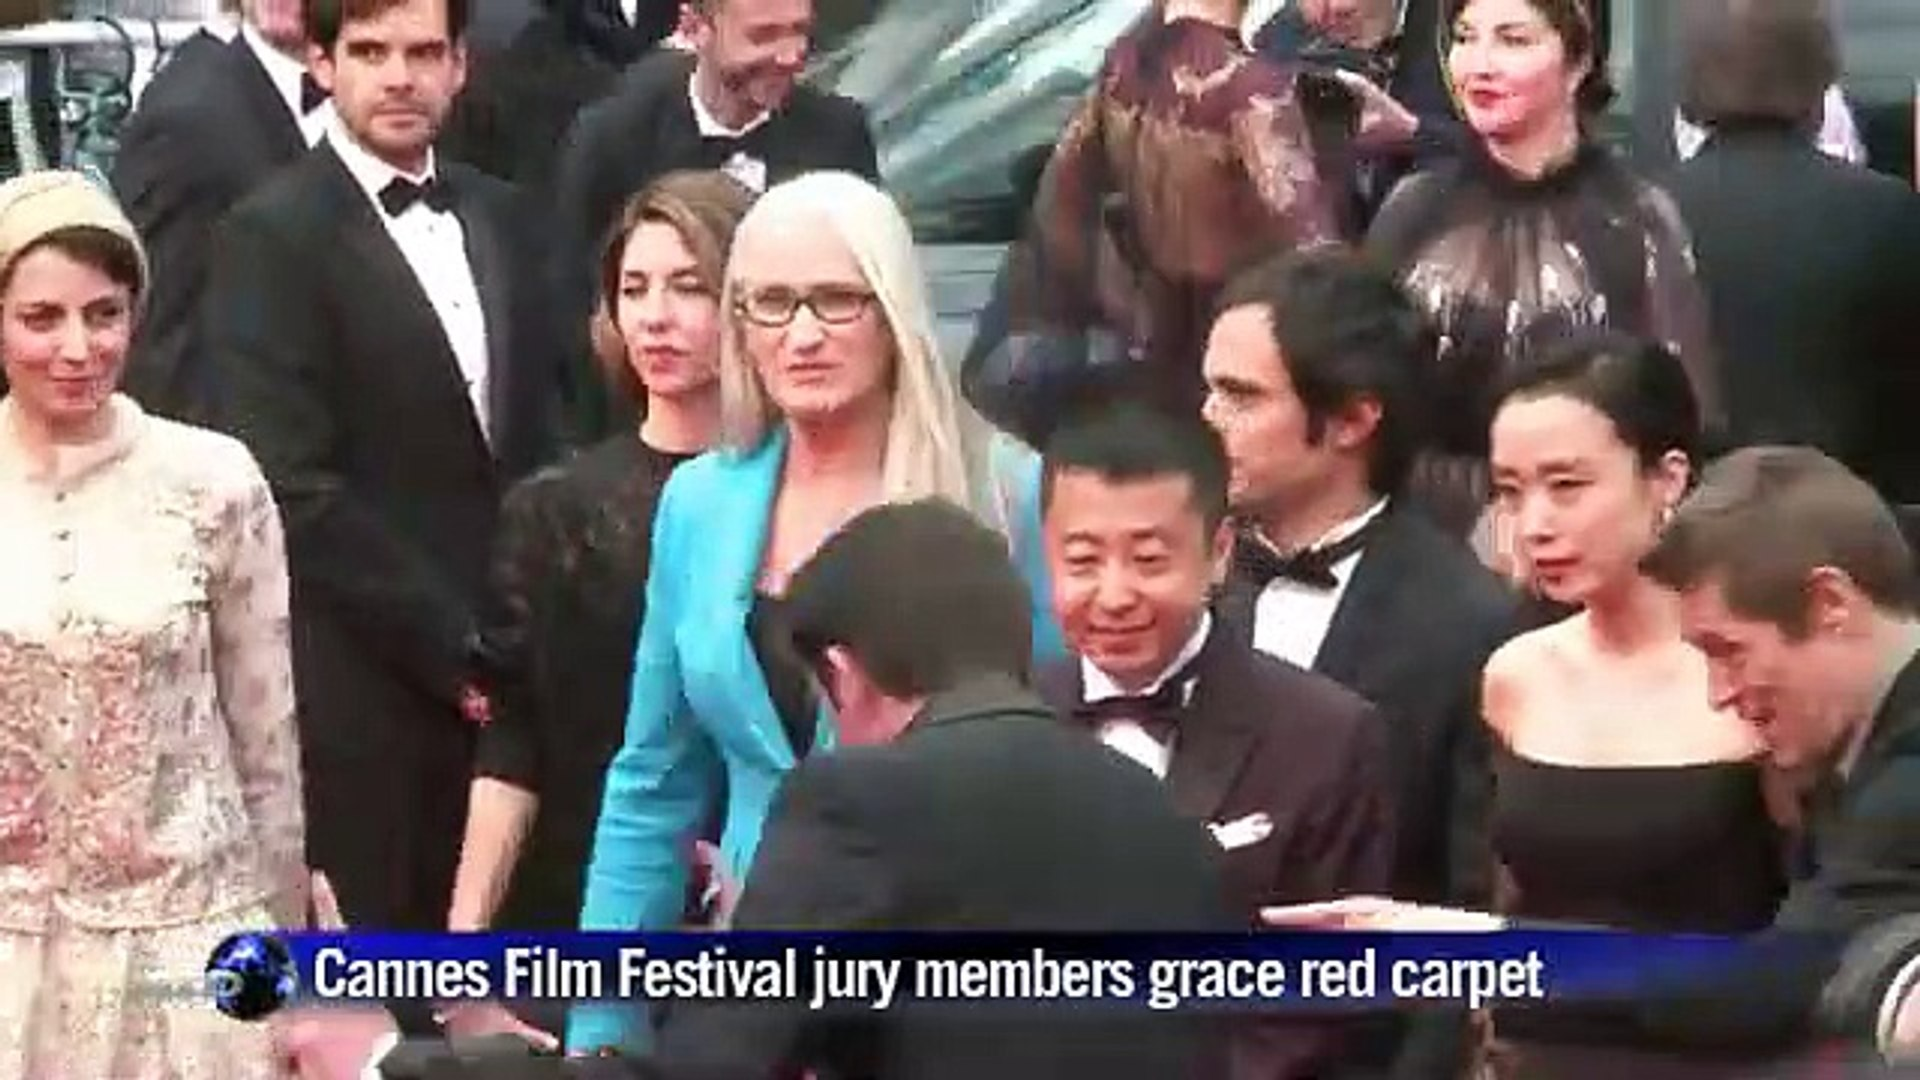 Cannes Film Festival jury members e red carpet